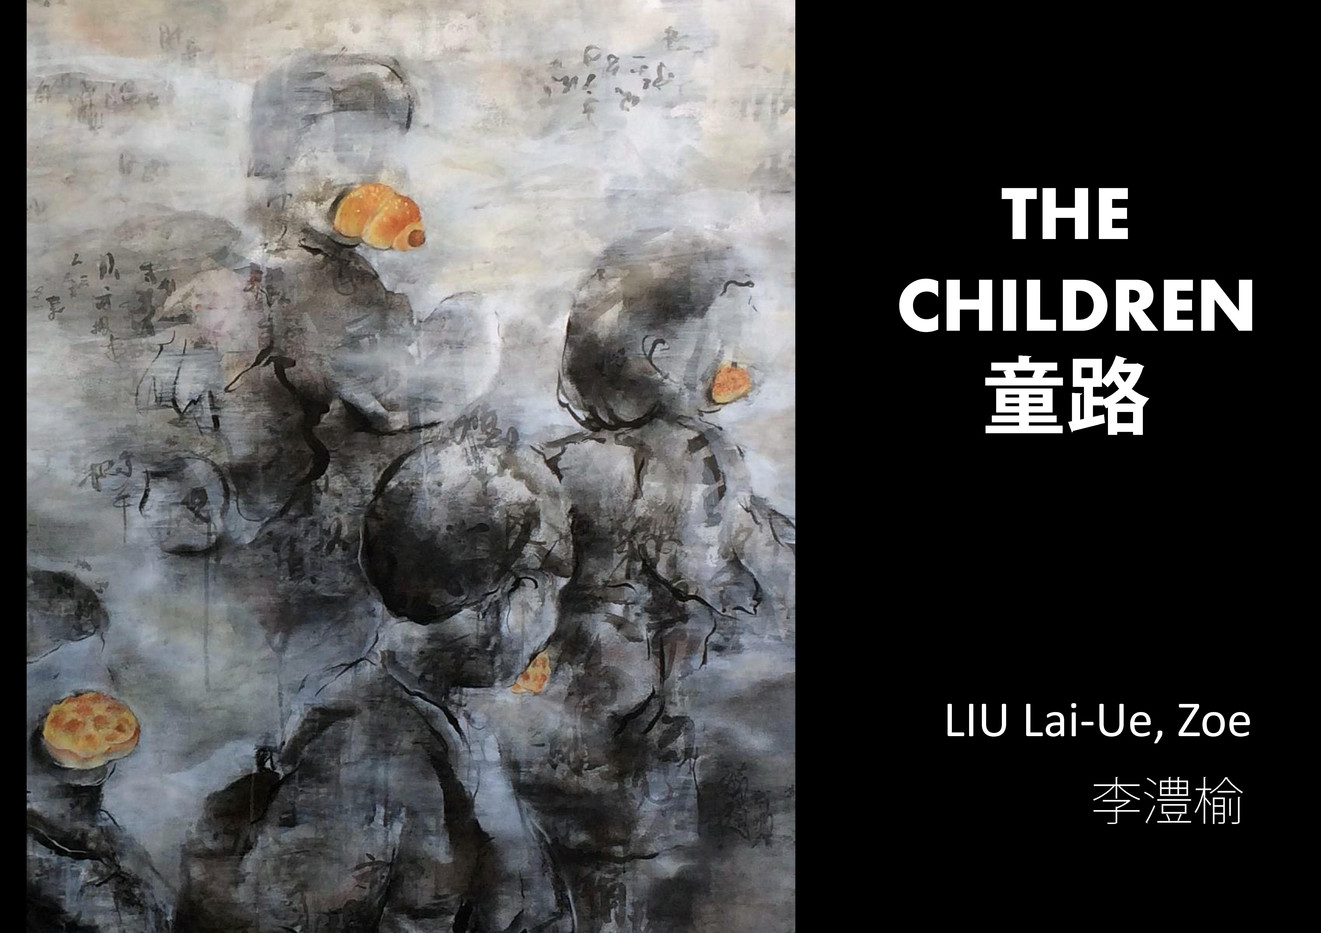 LIU Lai-Ue, Zoe 李澧榆